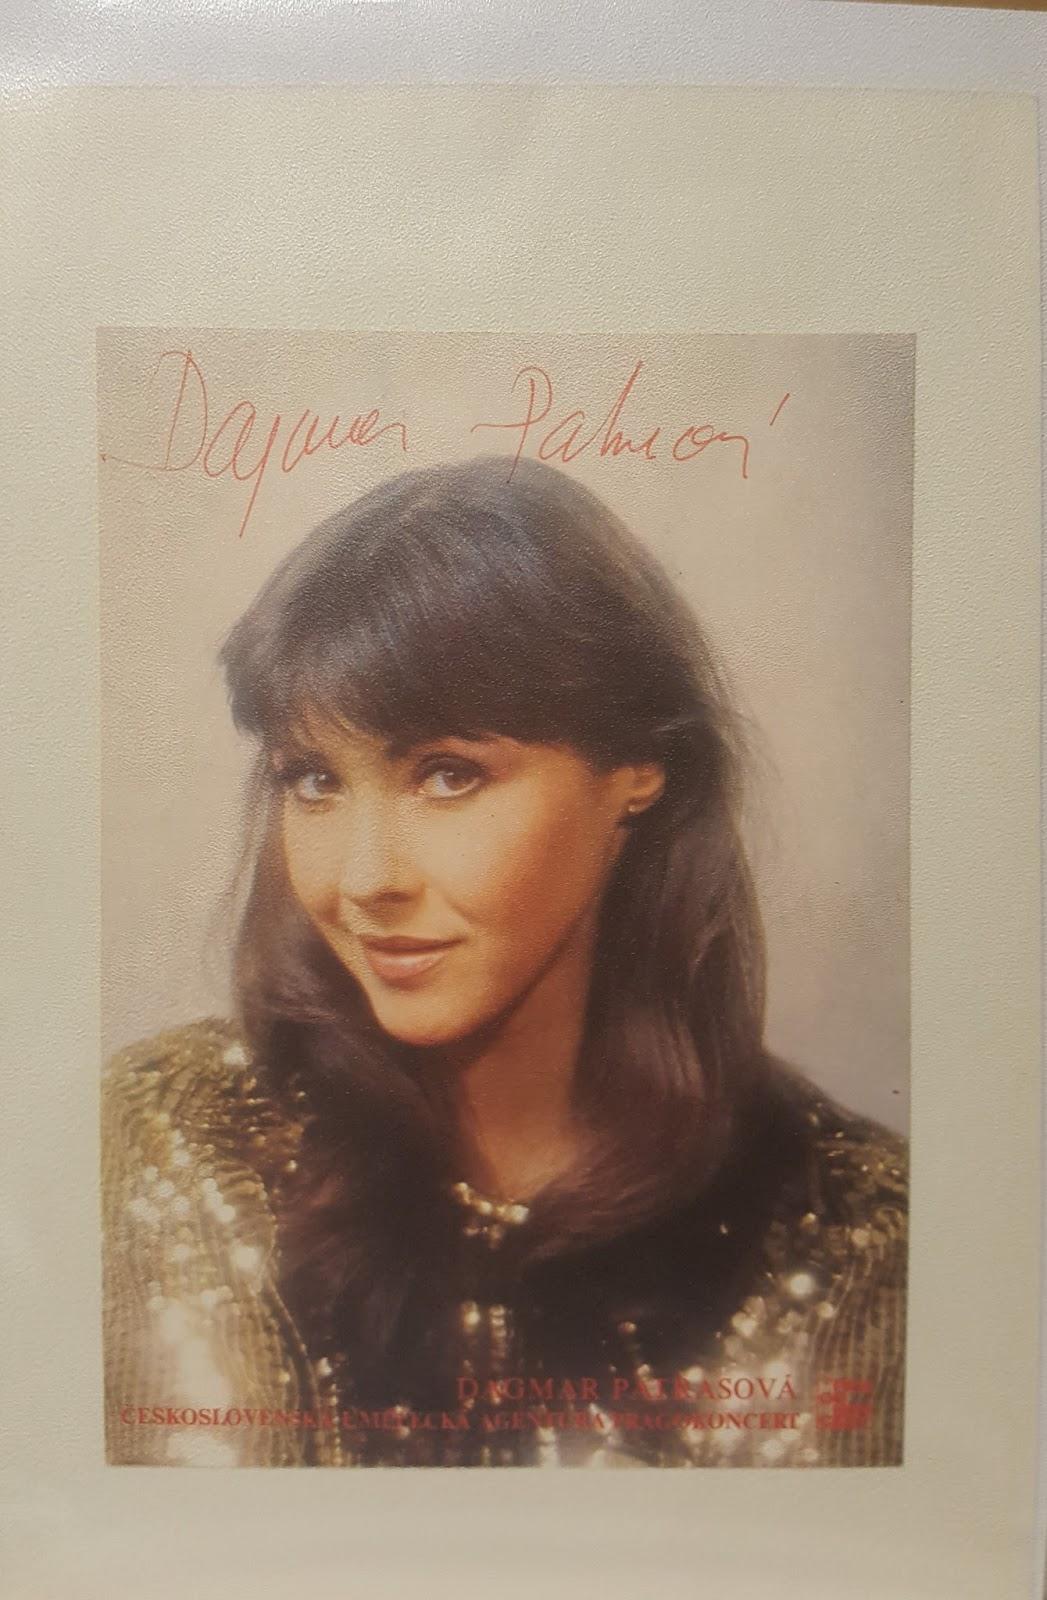 Cherie Lunghi (born 1952),Bel Powley (born 1992) XXX picture Nathalie Hart (b. 1992),Melody Kay